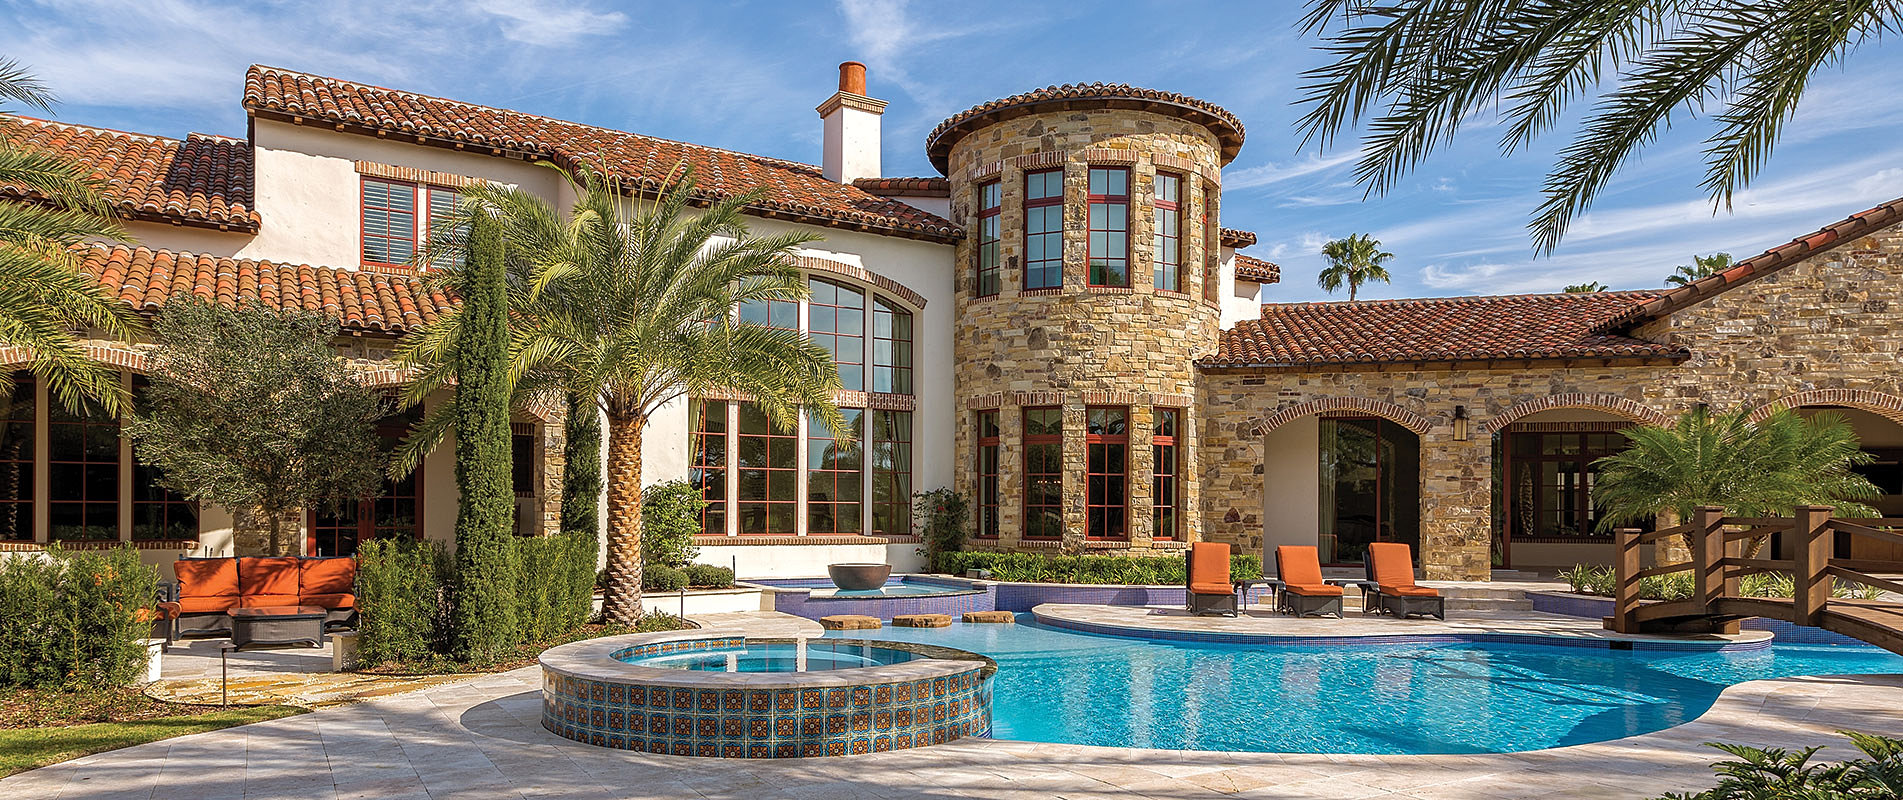 Best Luxury Pool Designs Gallery - Decorating Design Ideas ...